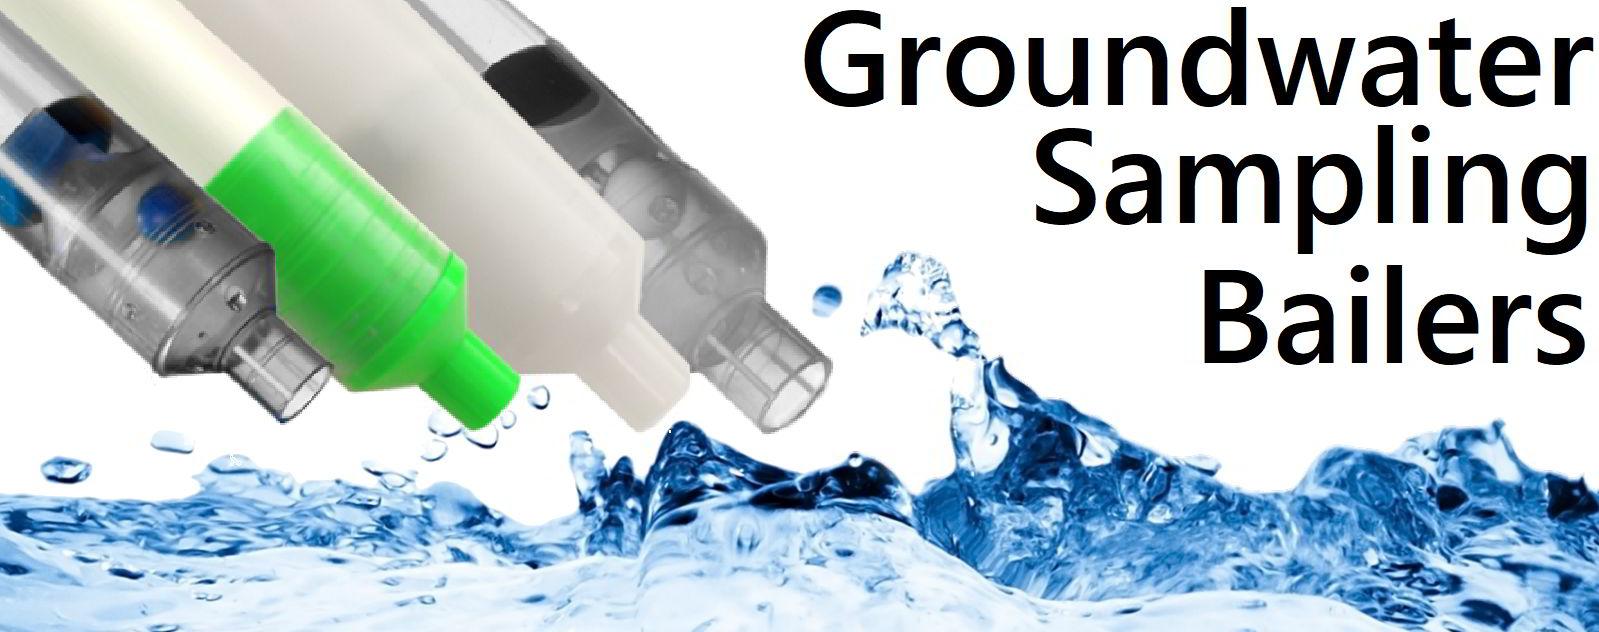 Groundwater Sampling Bailers